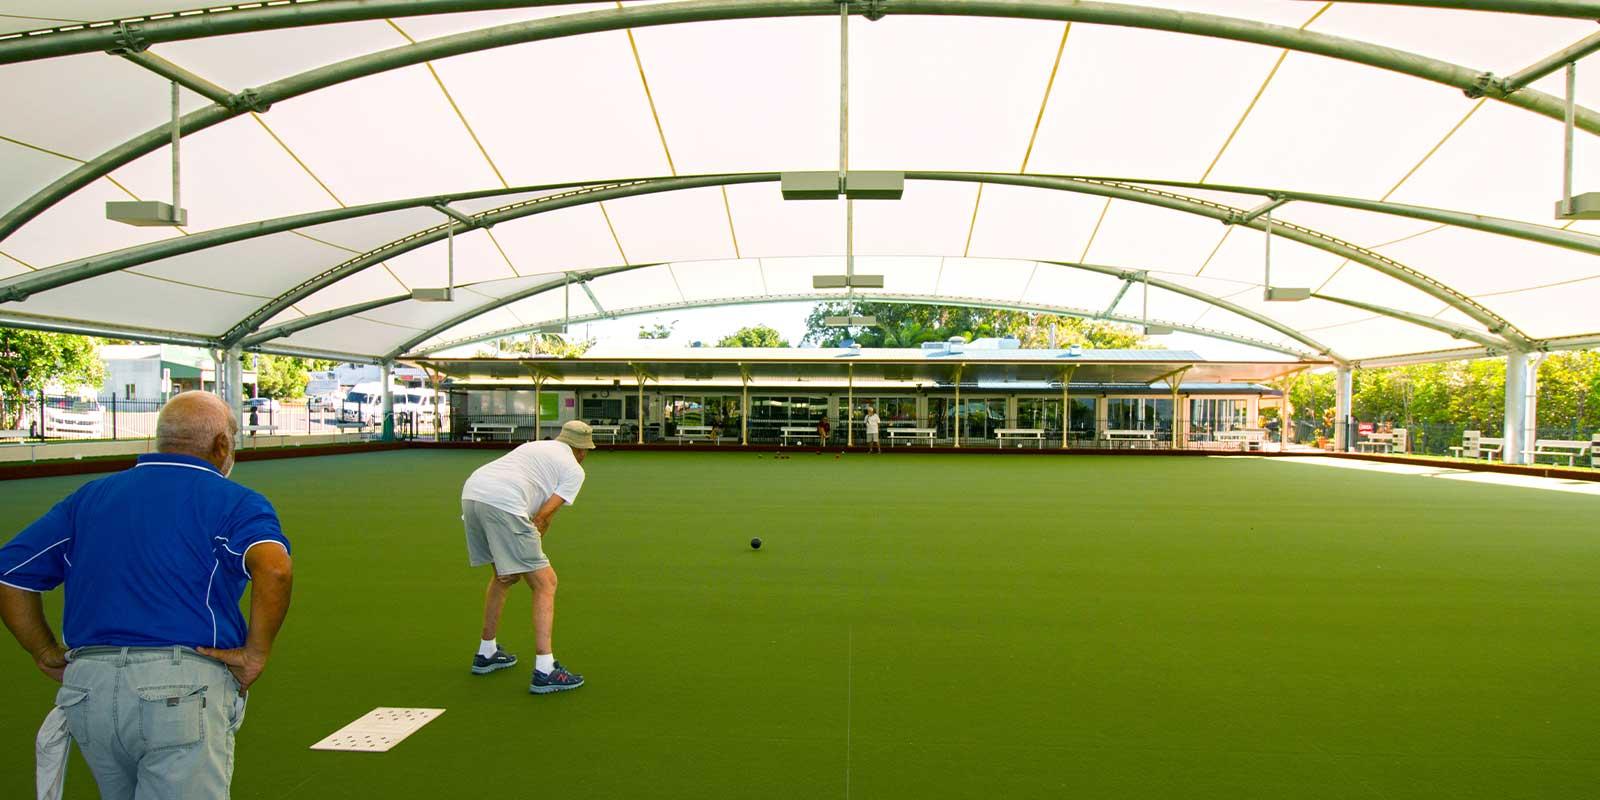 Cooktown Bowls Club